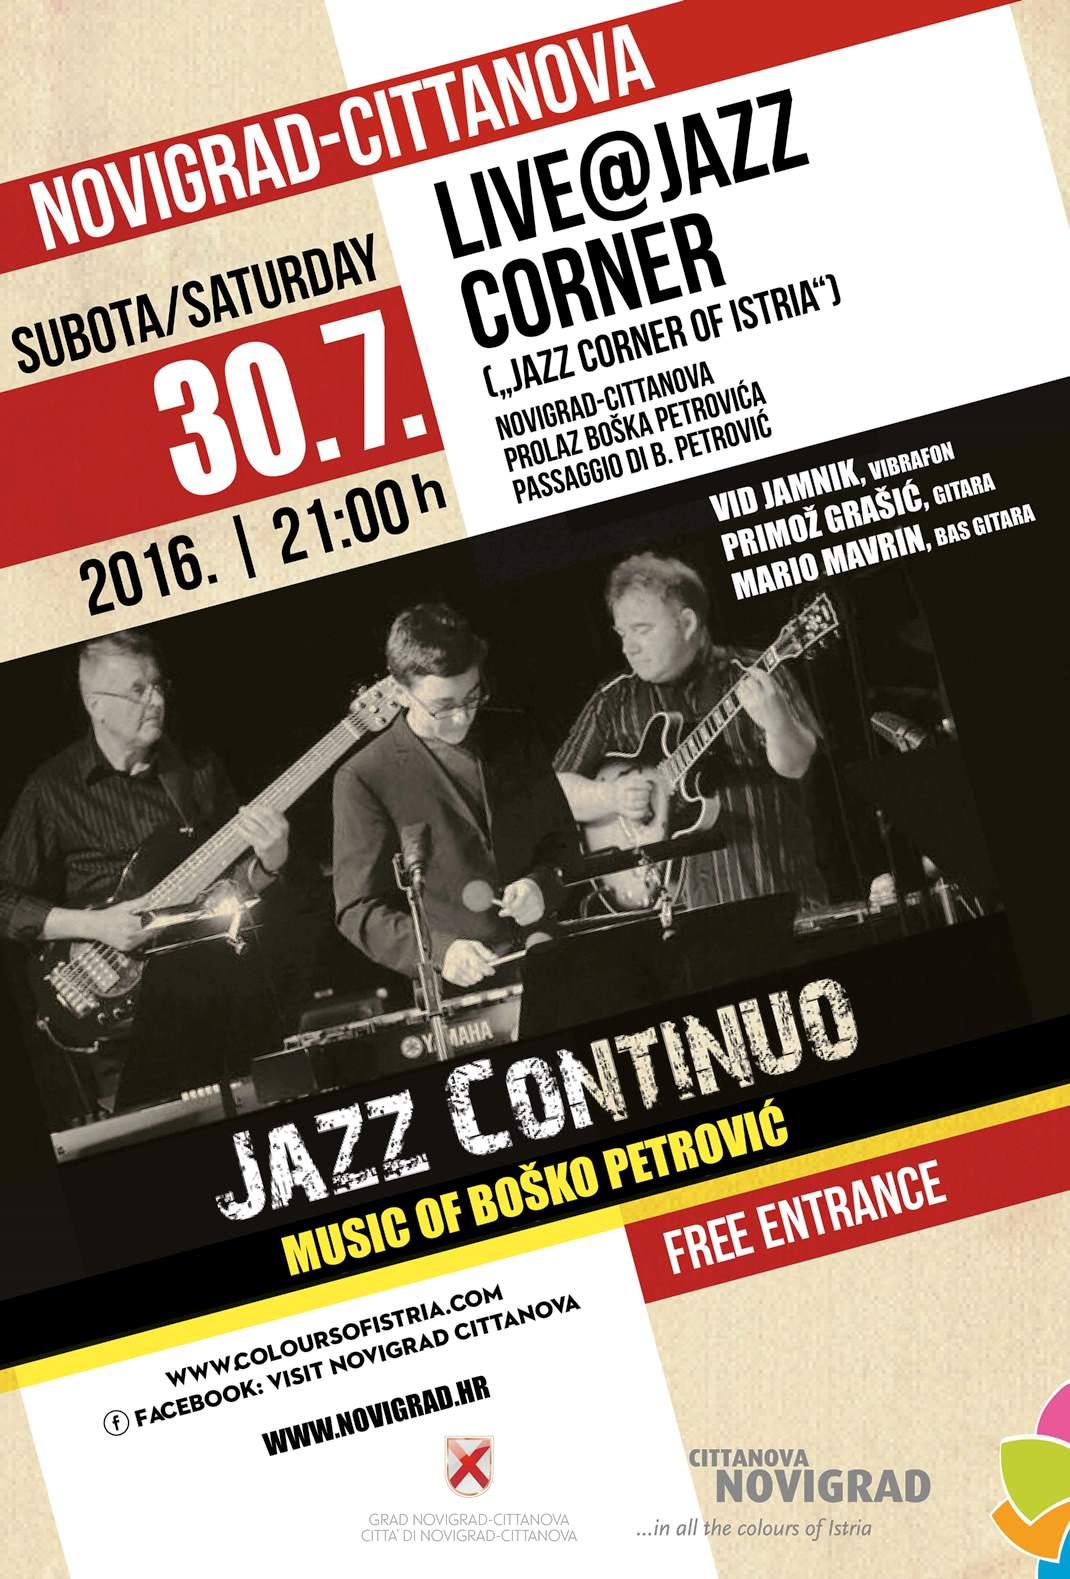 http://www.novigrad.hr/koncert_jazz_continuo_glazba_boshka_petrovia